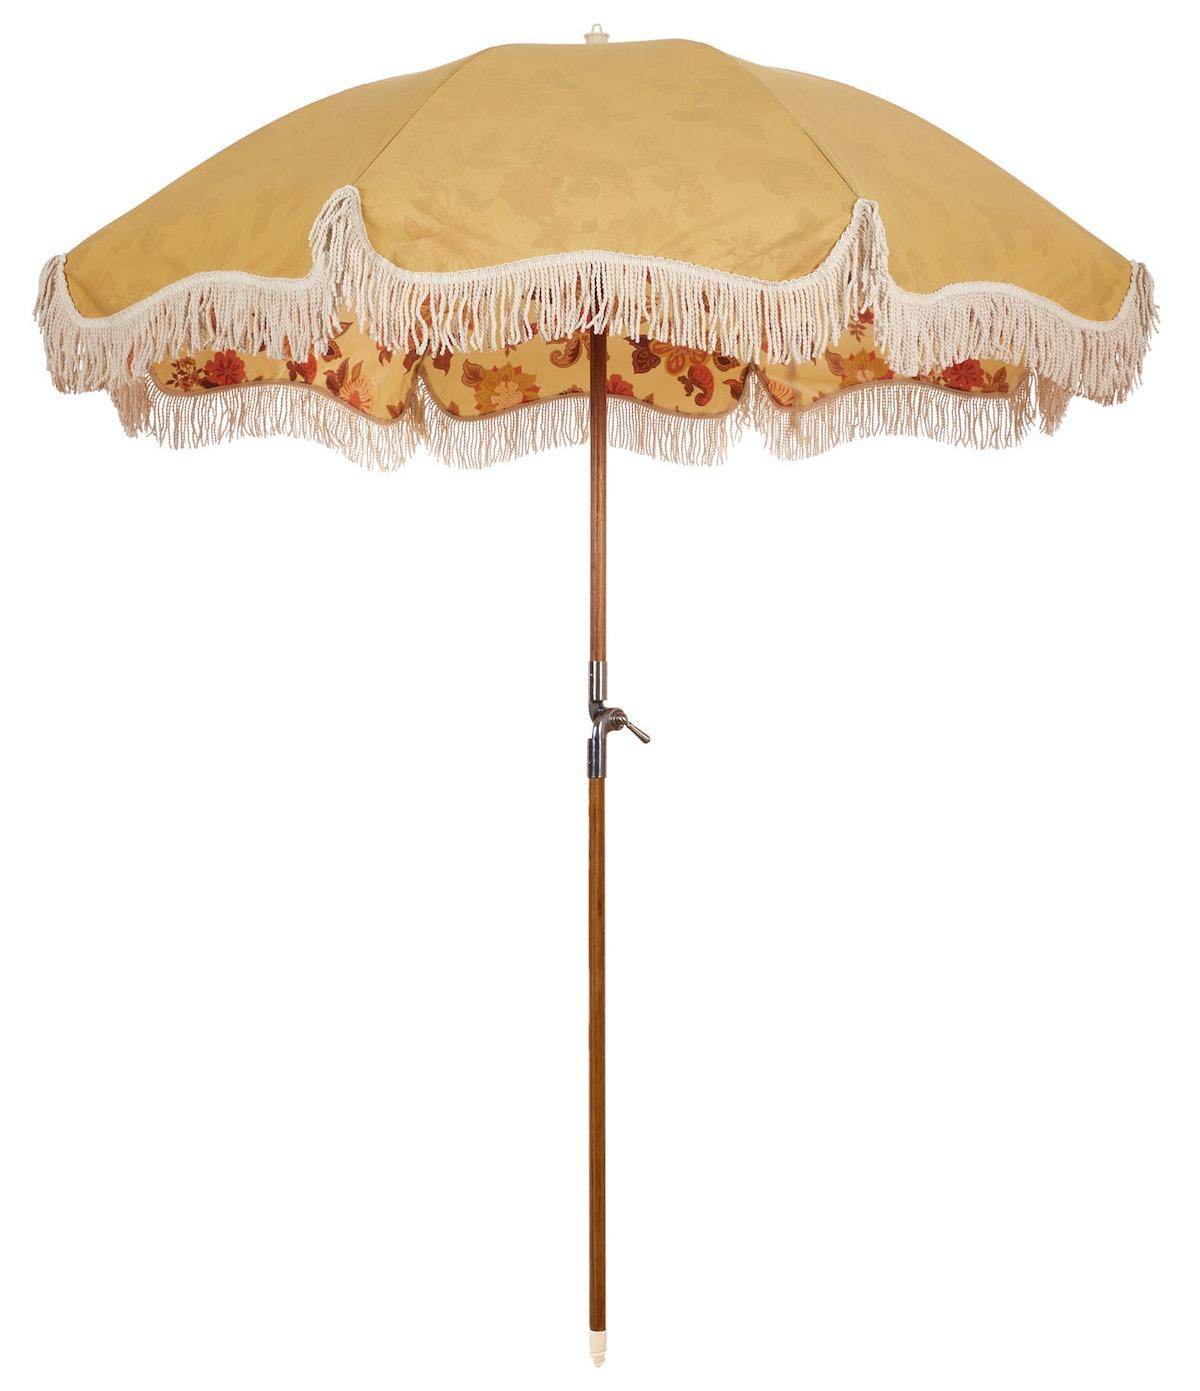 The Premium Beach Umbrella - Paisley Bay